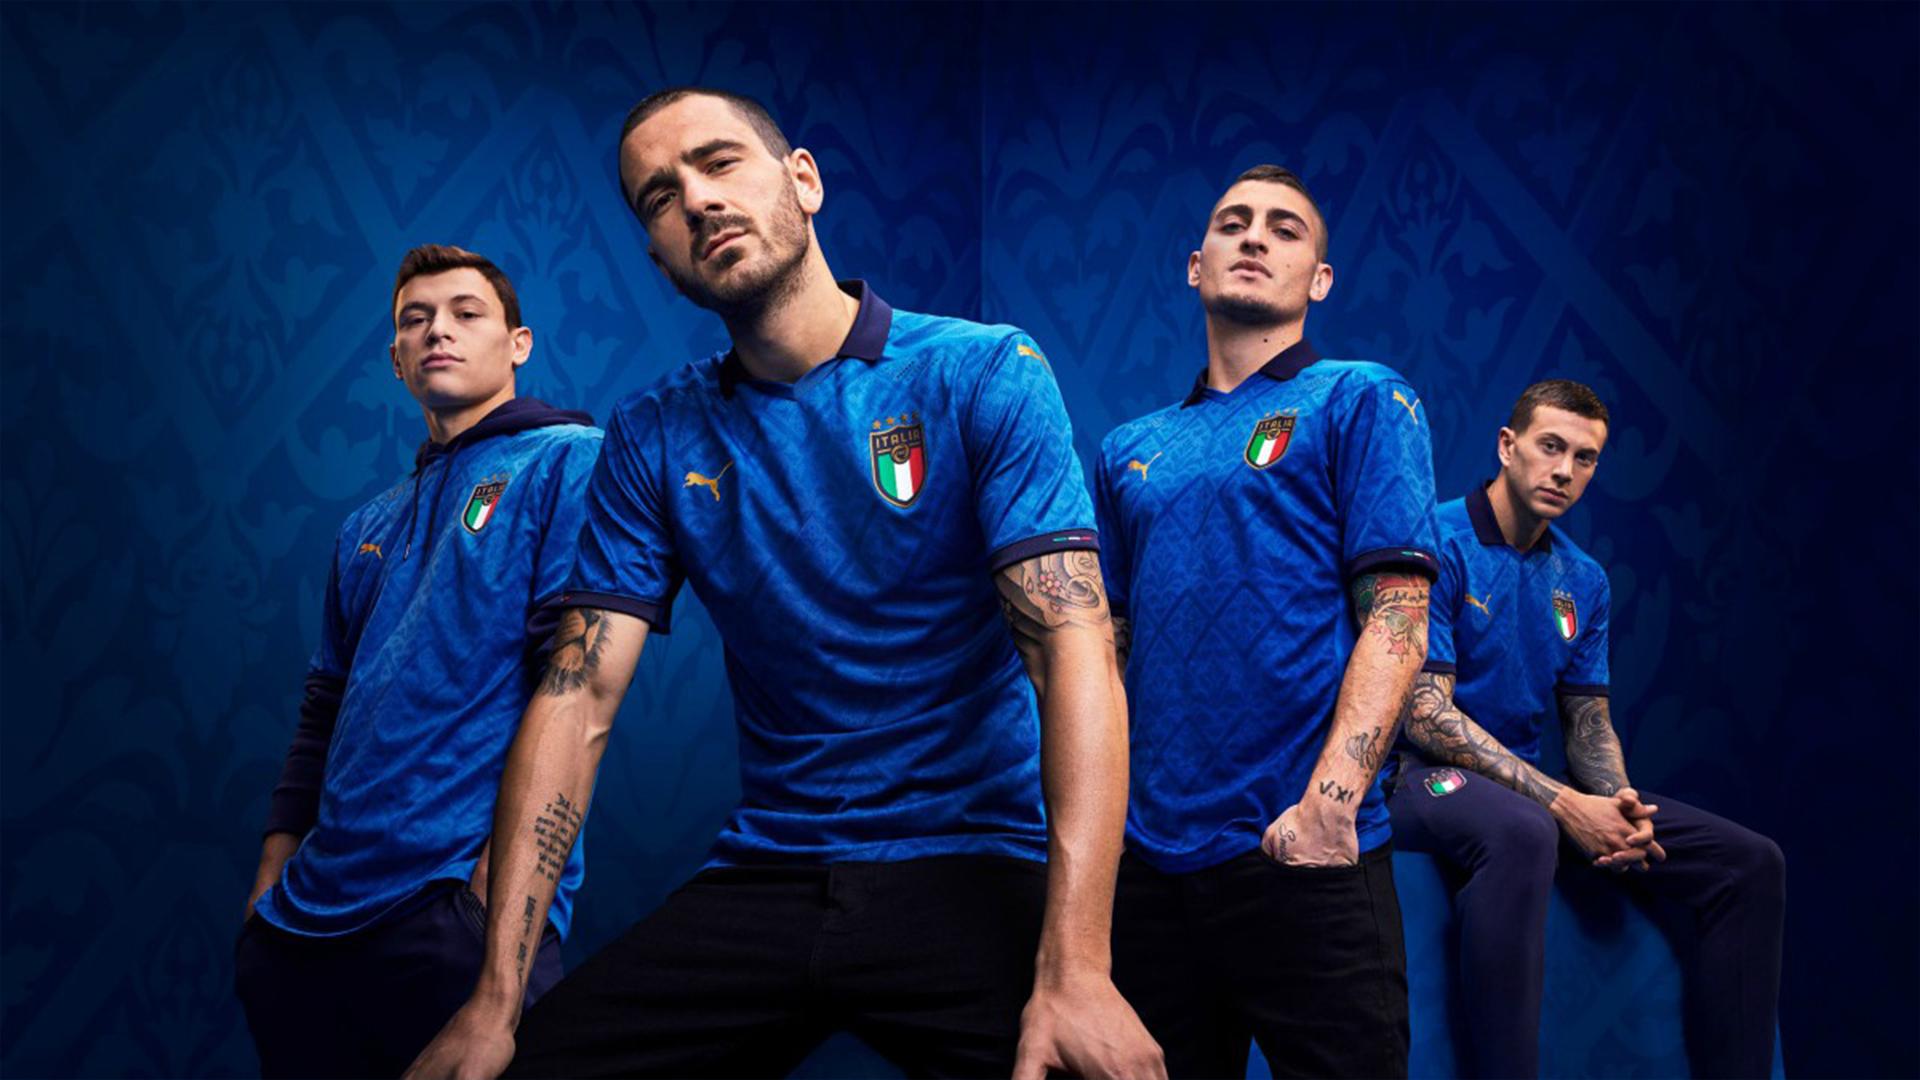 escudo-italia-2-apolo-blog